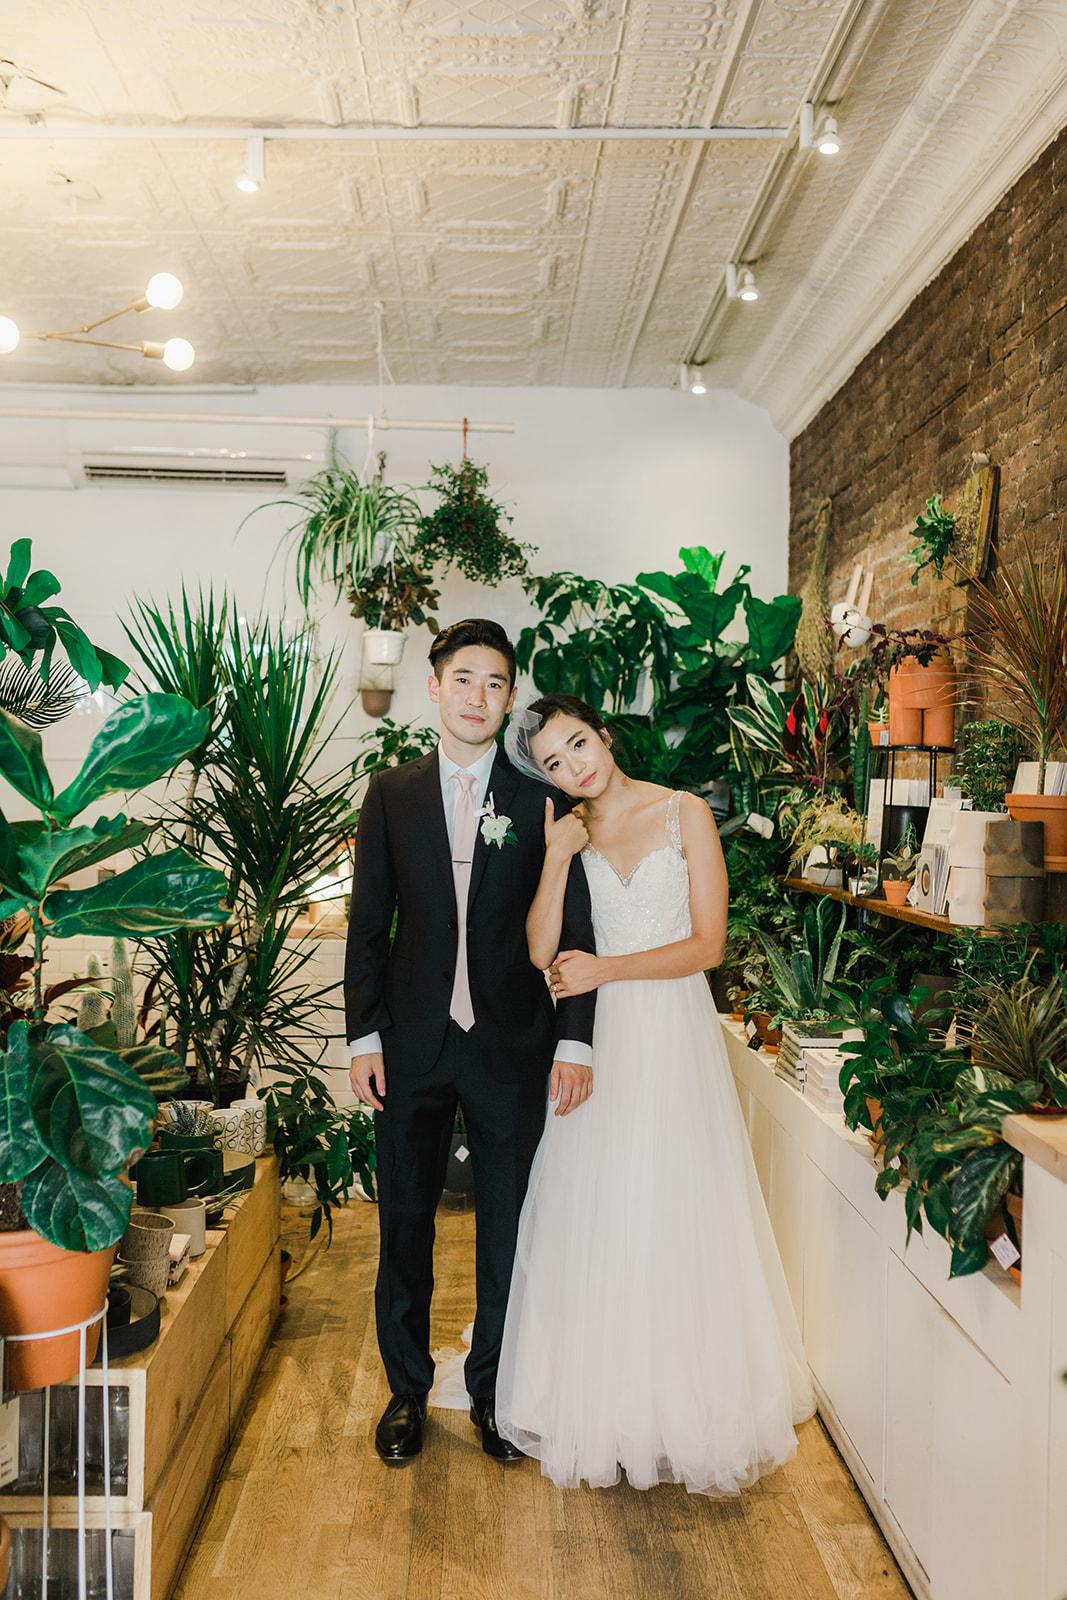 JWHJ-married-126.jpg